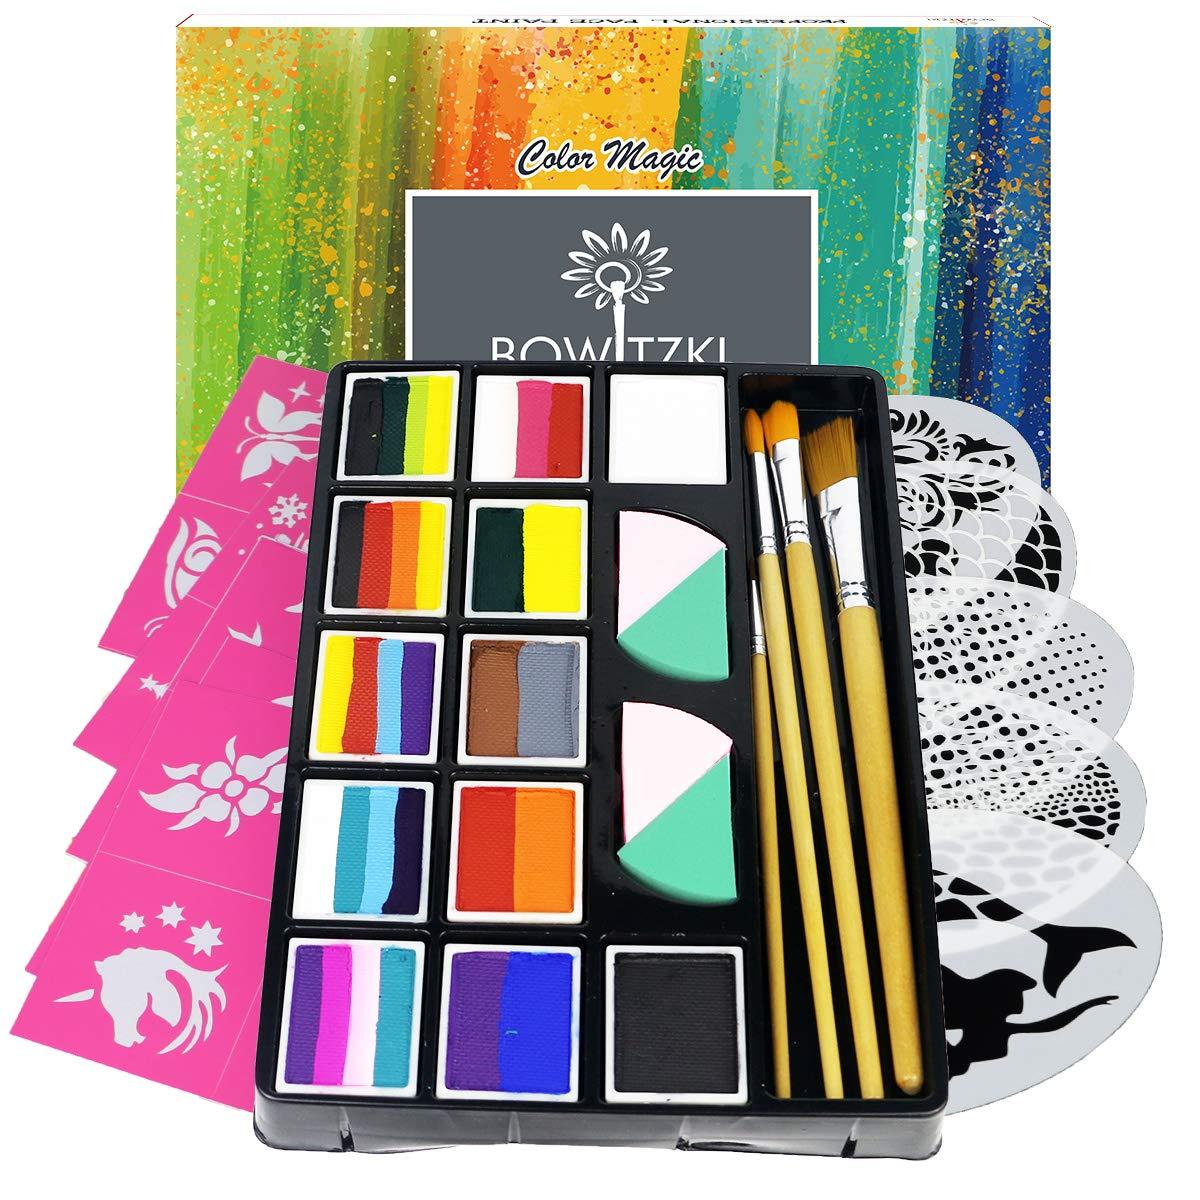 Bowitzki - Professional Face Painting Kit